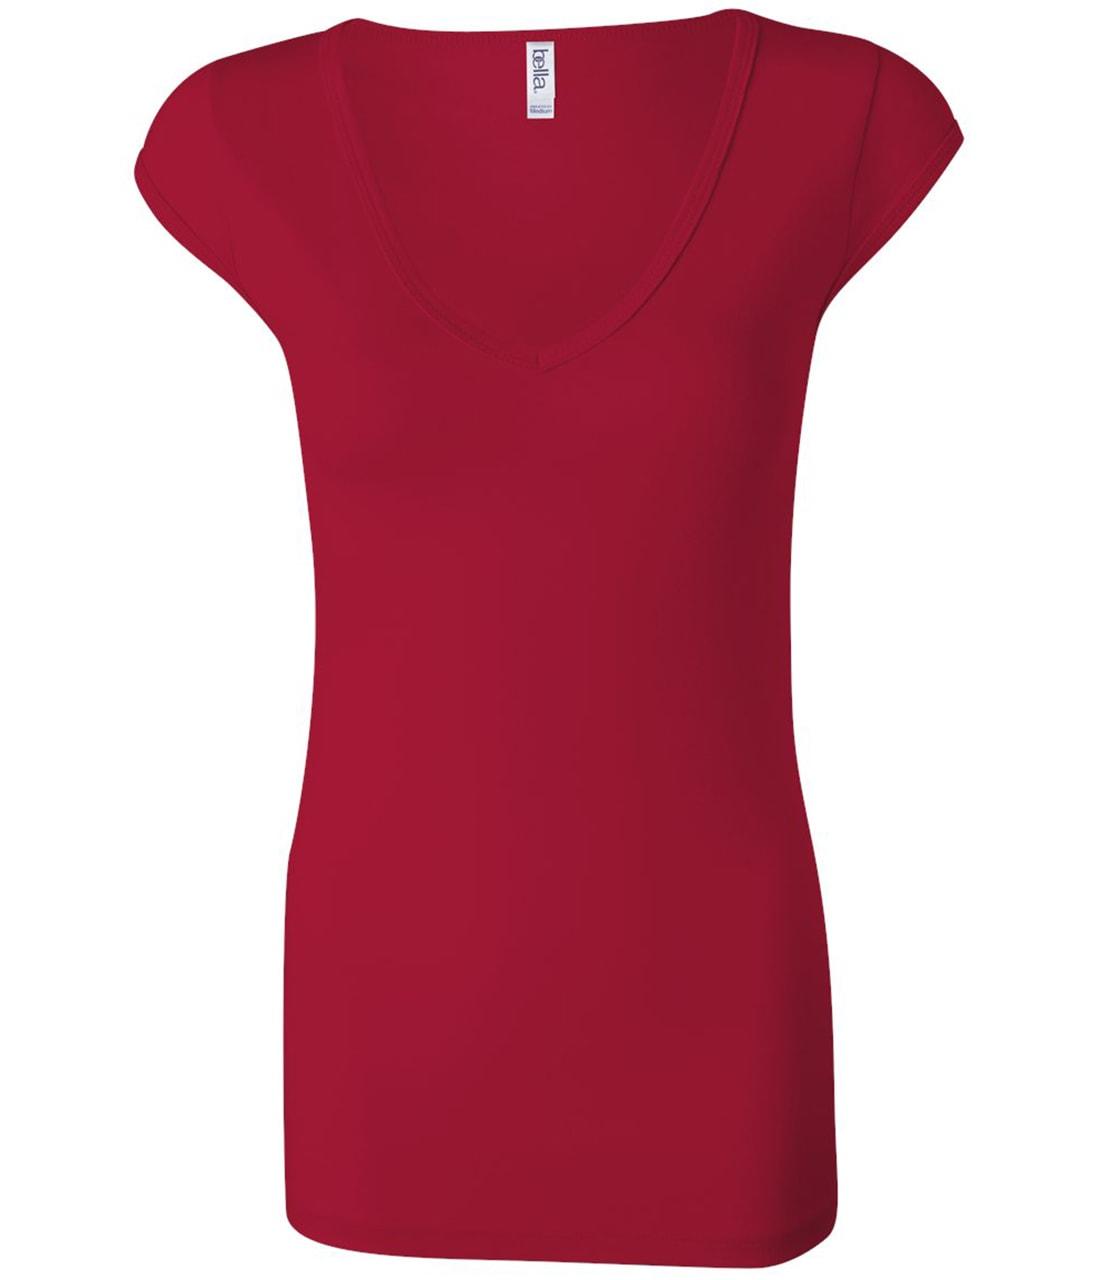 Picture of Bella Canvas Sheer Rib Cap Sleeve Deep V-Neck T-Shirt